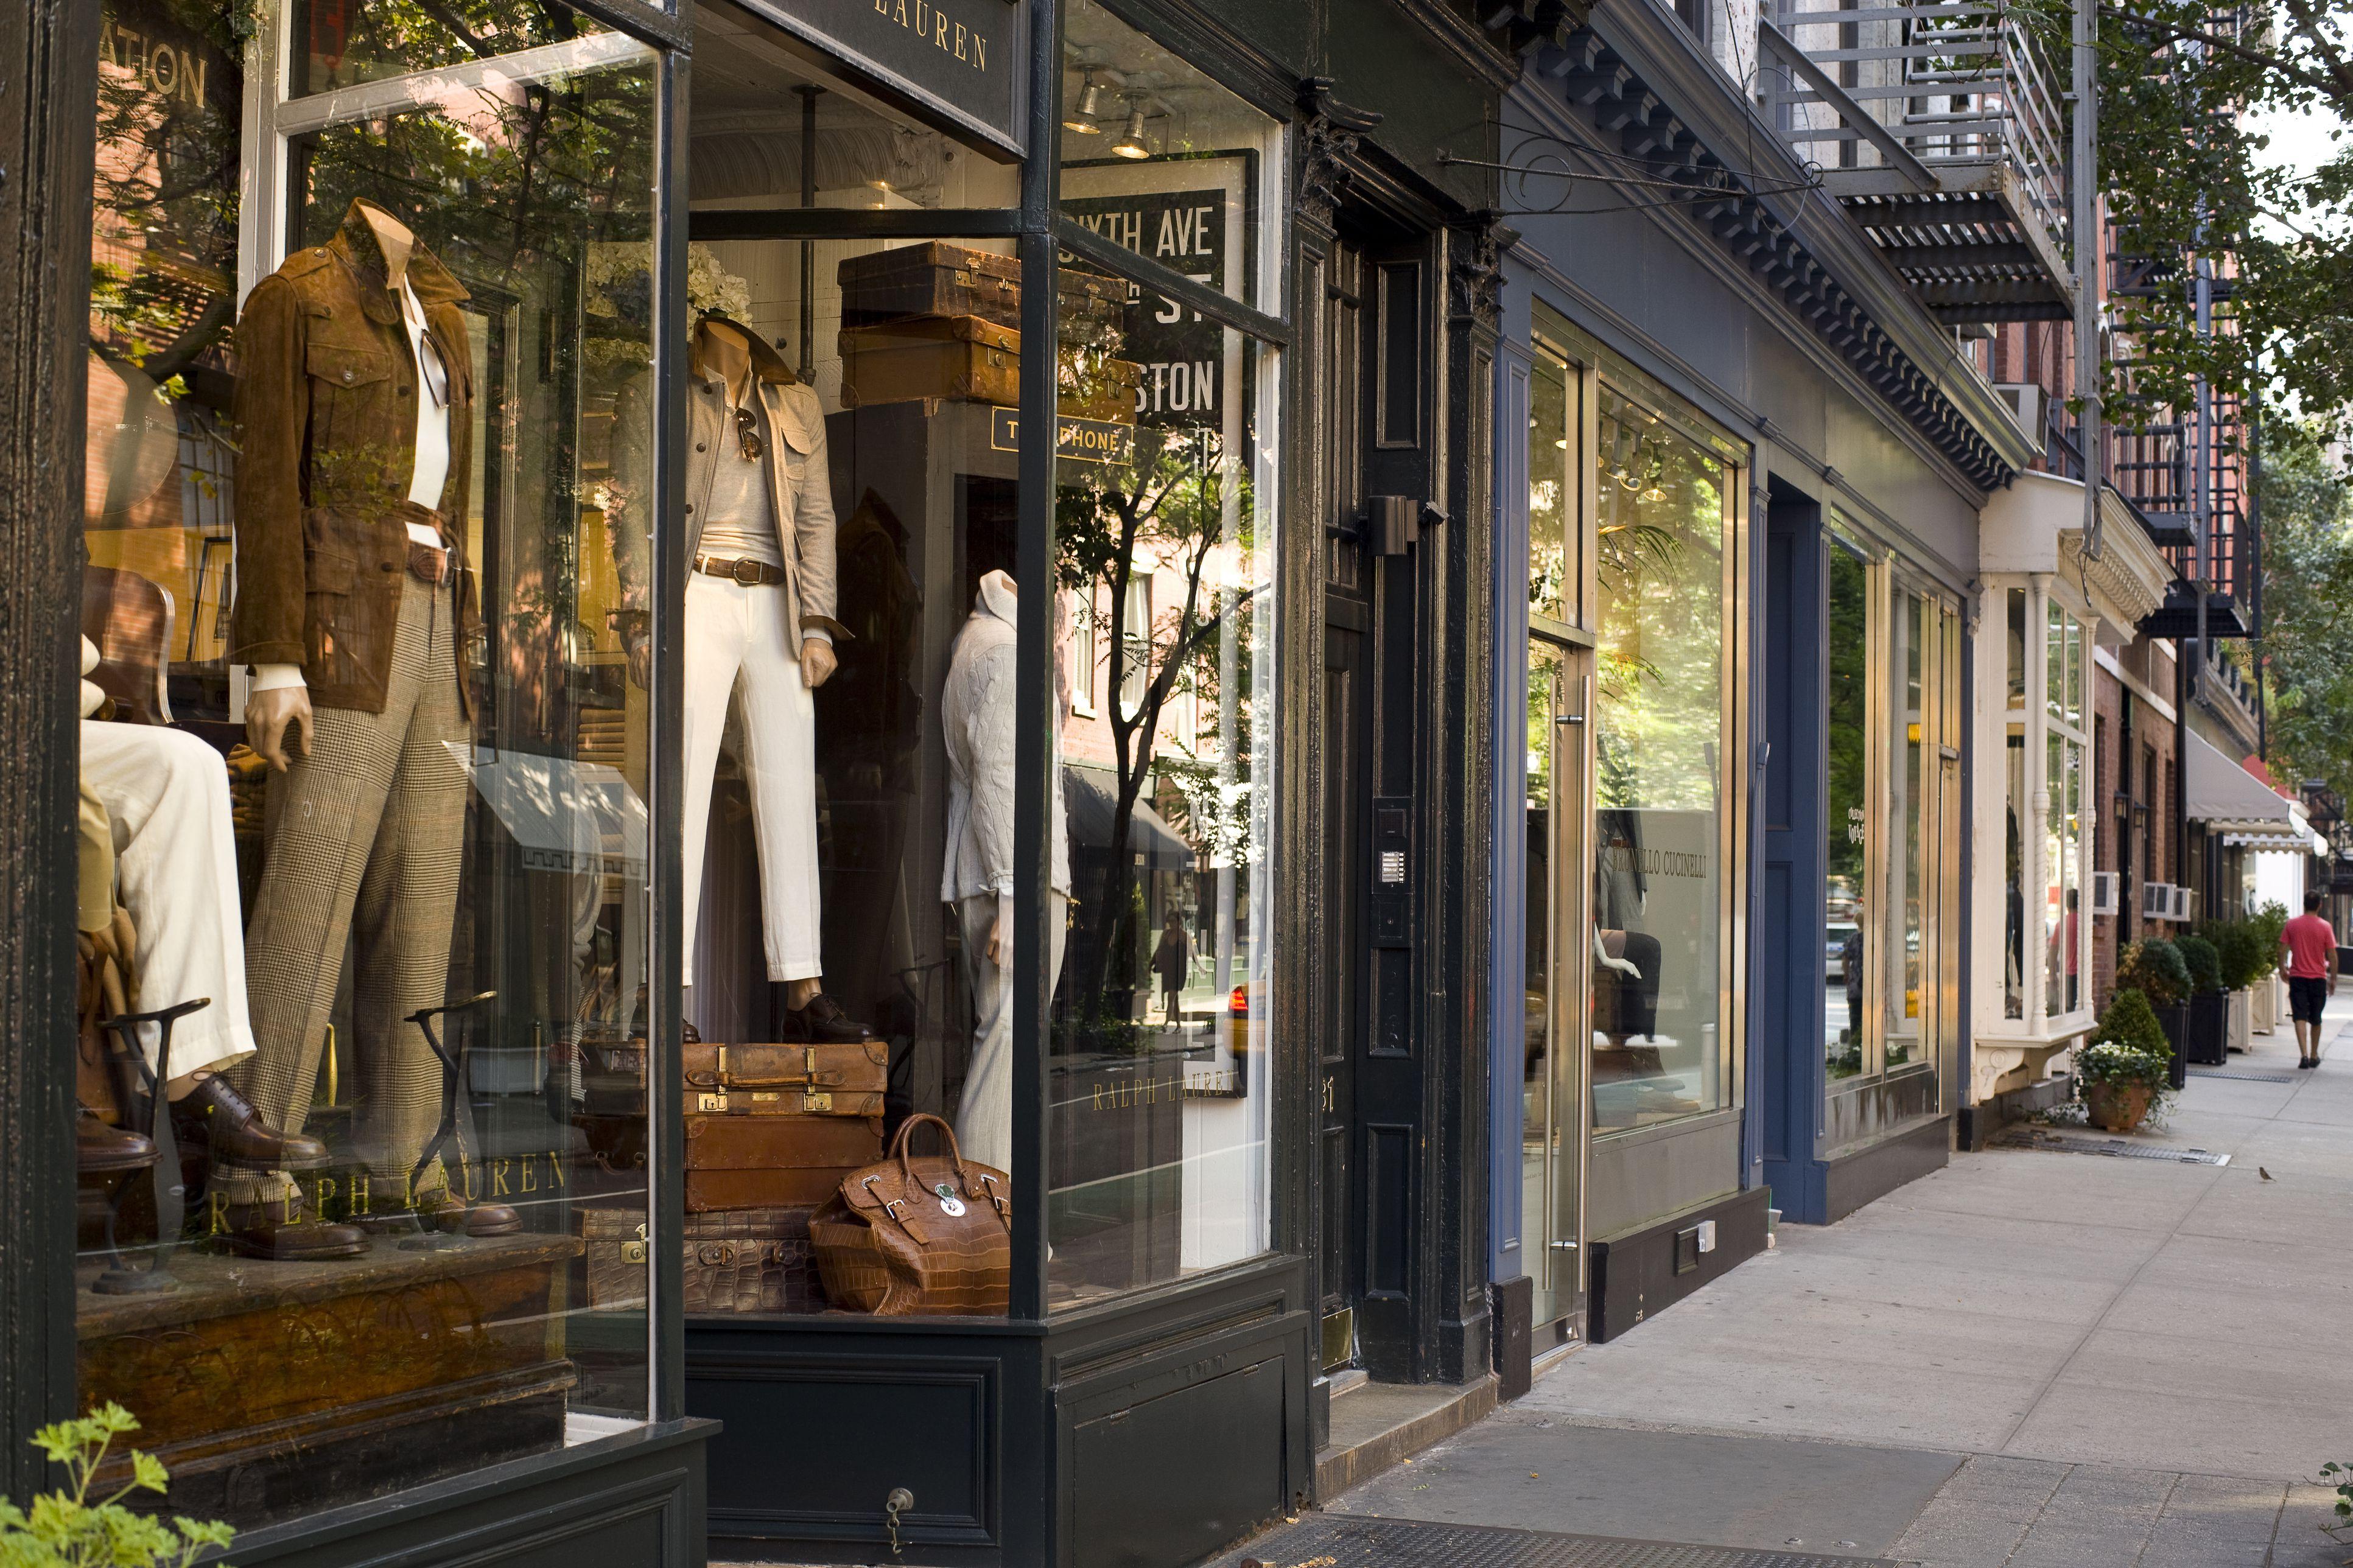 Fetish shops in new york city